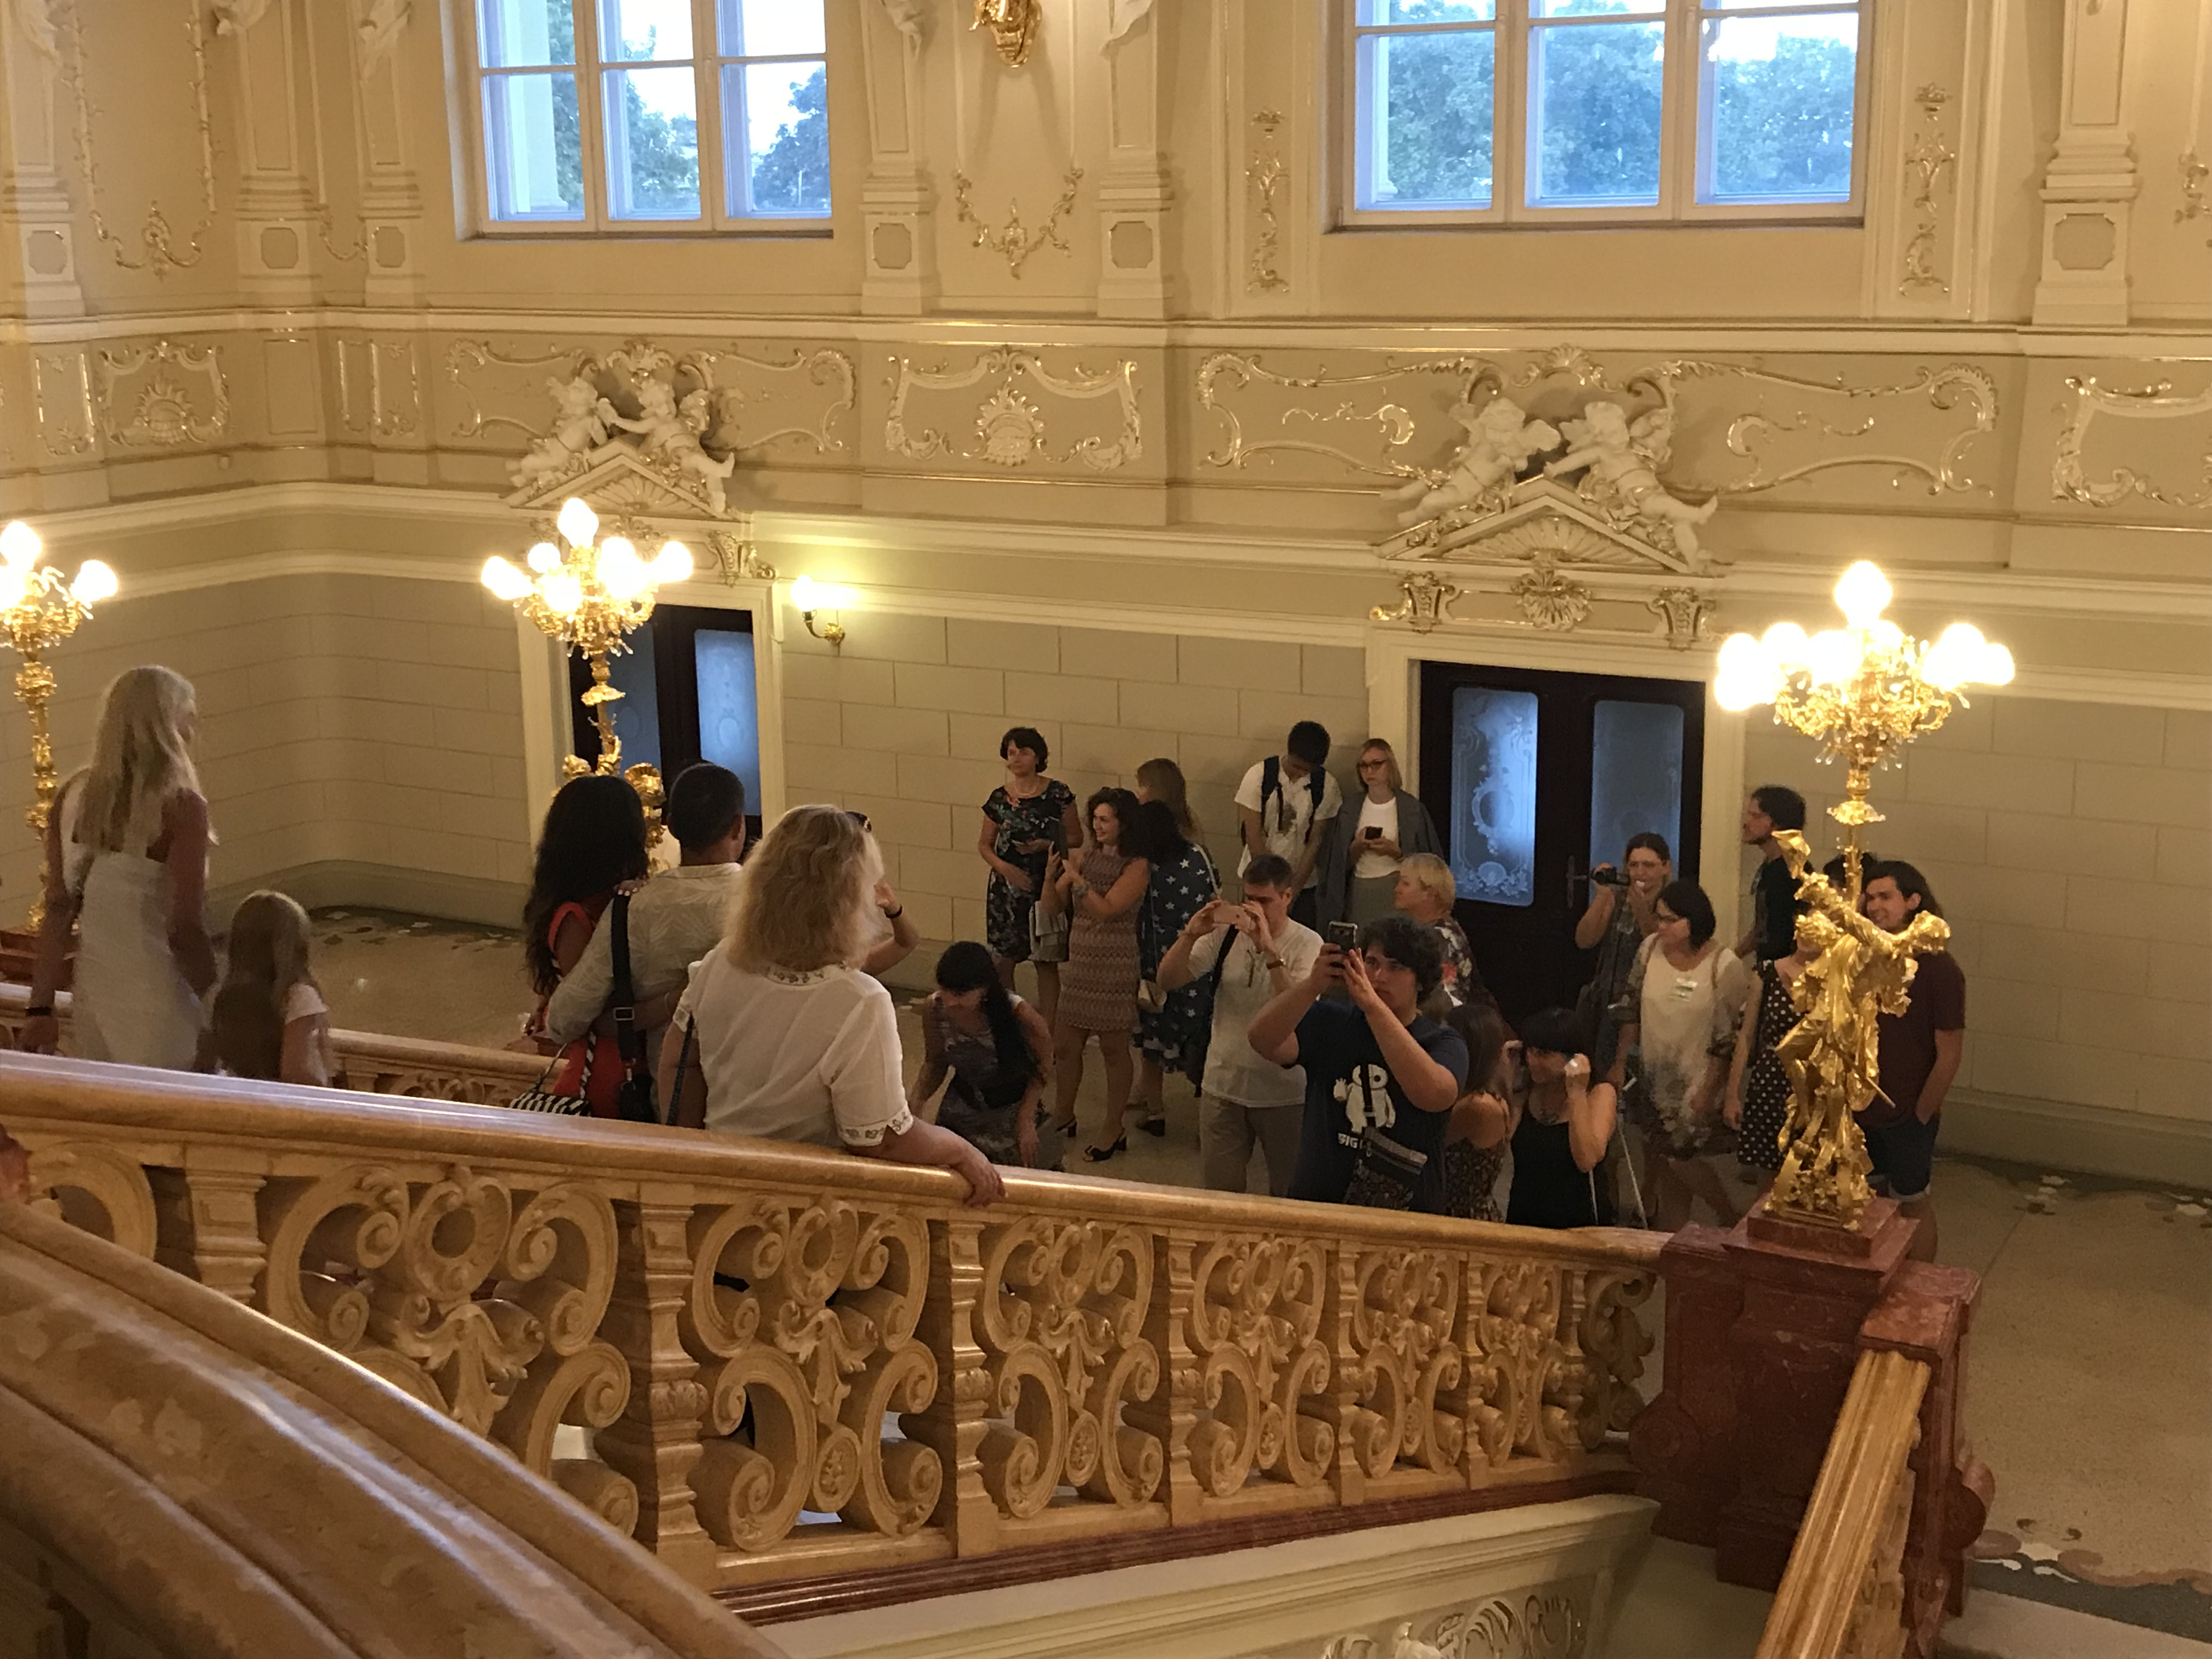 Odessa Opernhaus Treppe Selfies